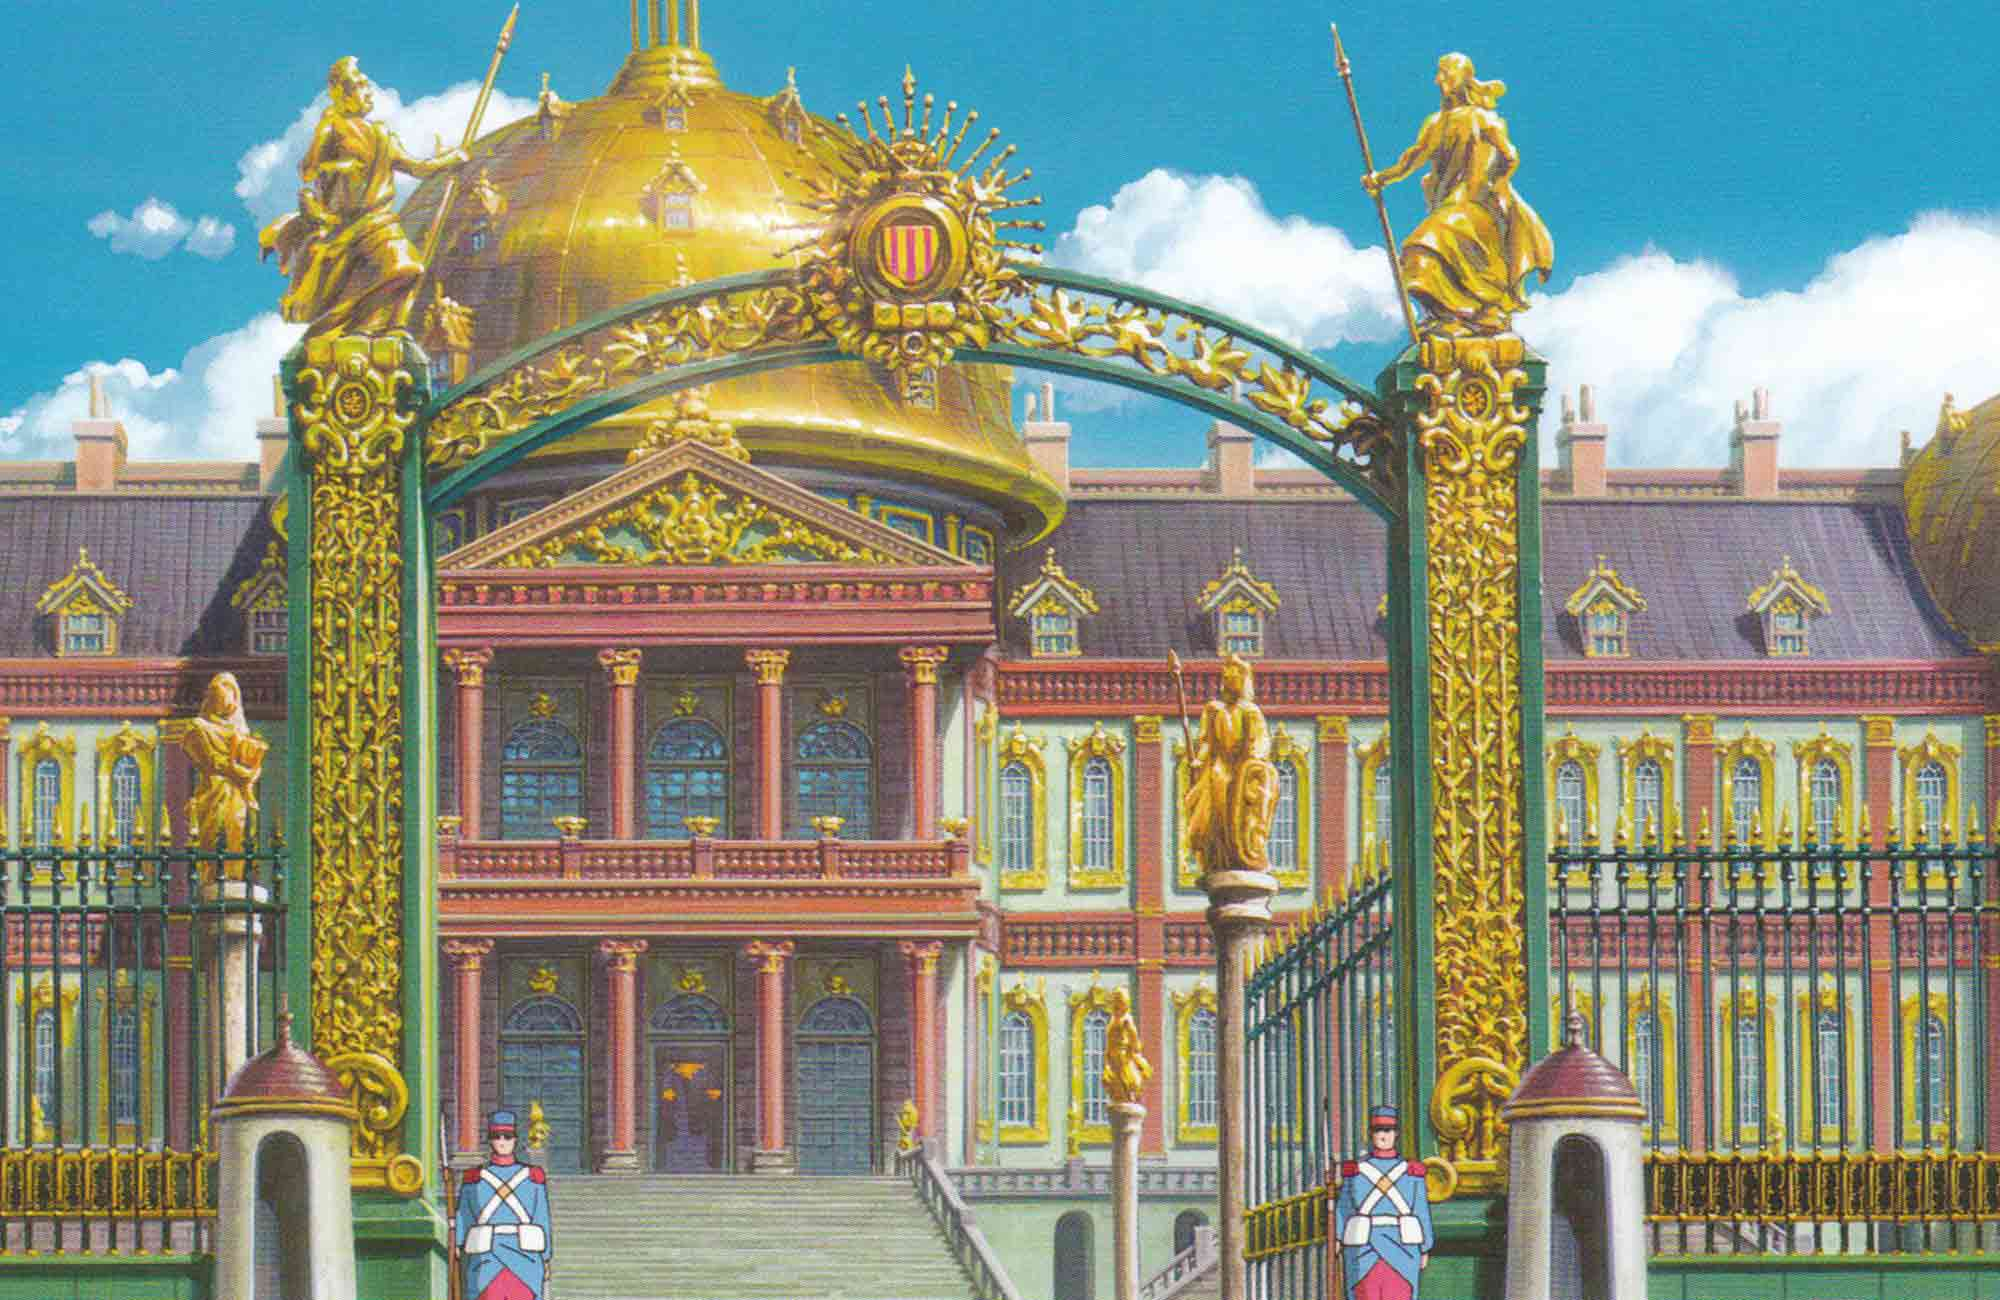 cchateau-ambulant-miyazaki-studio-ghibli-palais-hofburg-vienne-suliman